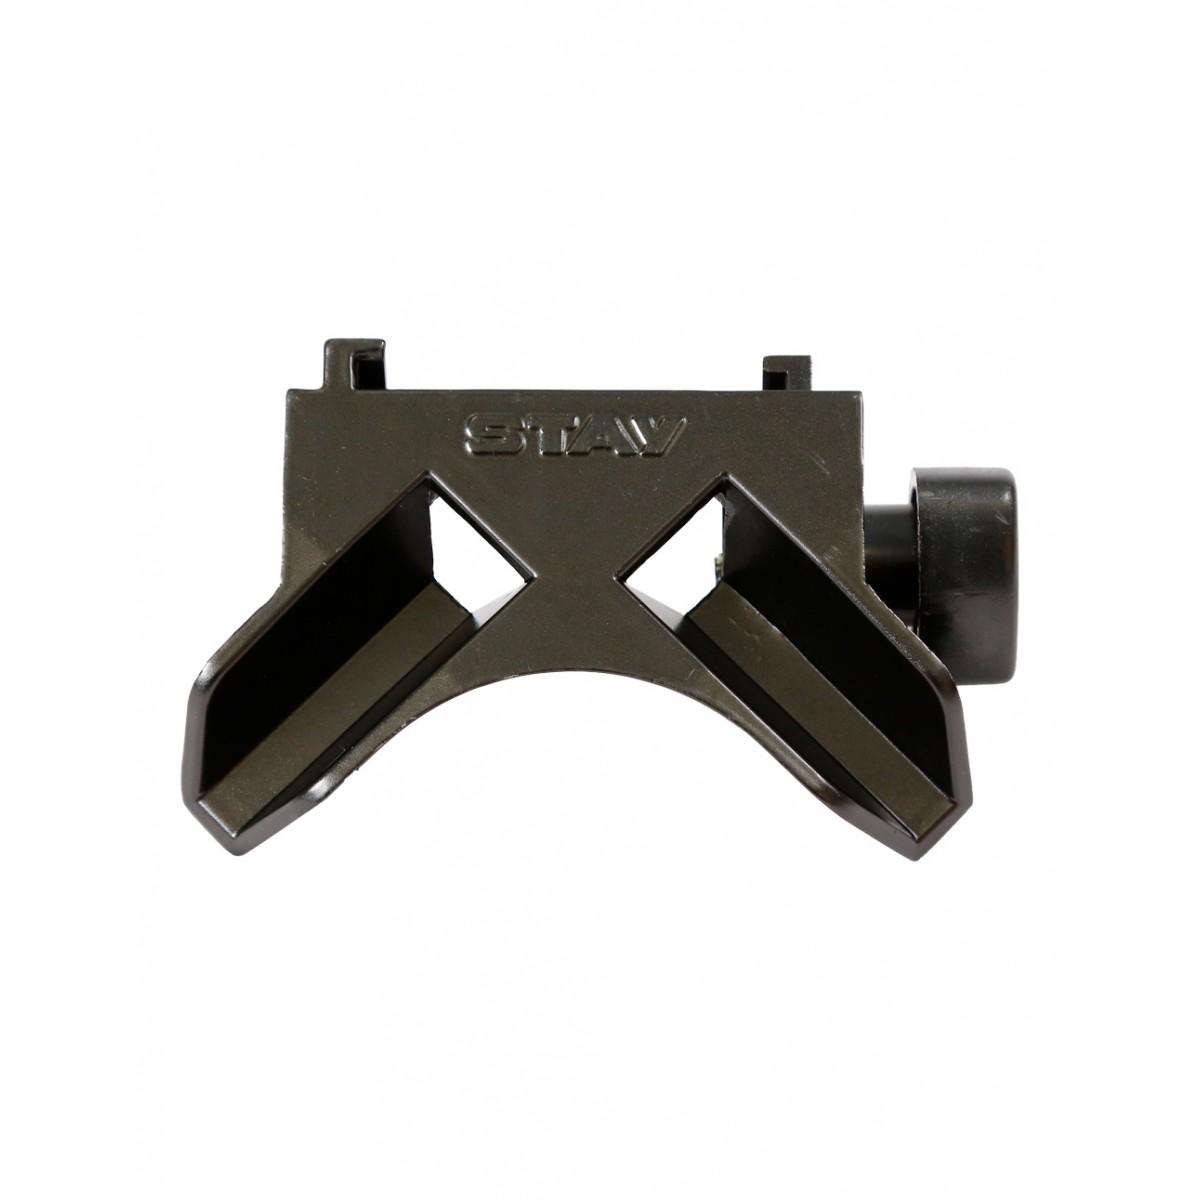 Kit - Braços p/ Slim ou Compact (longarinas) 380mm + Base Reta p/ Slim ou Compact